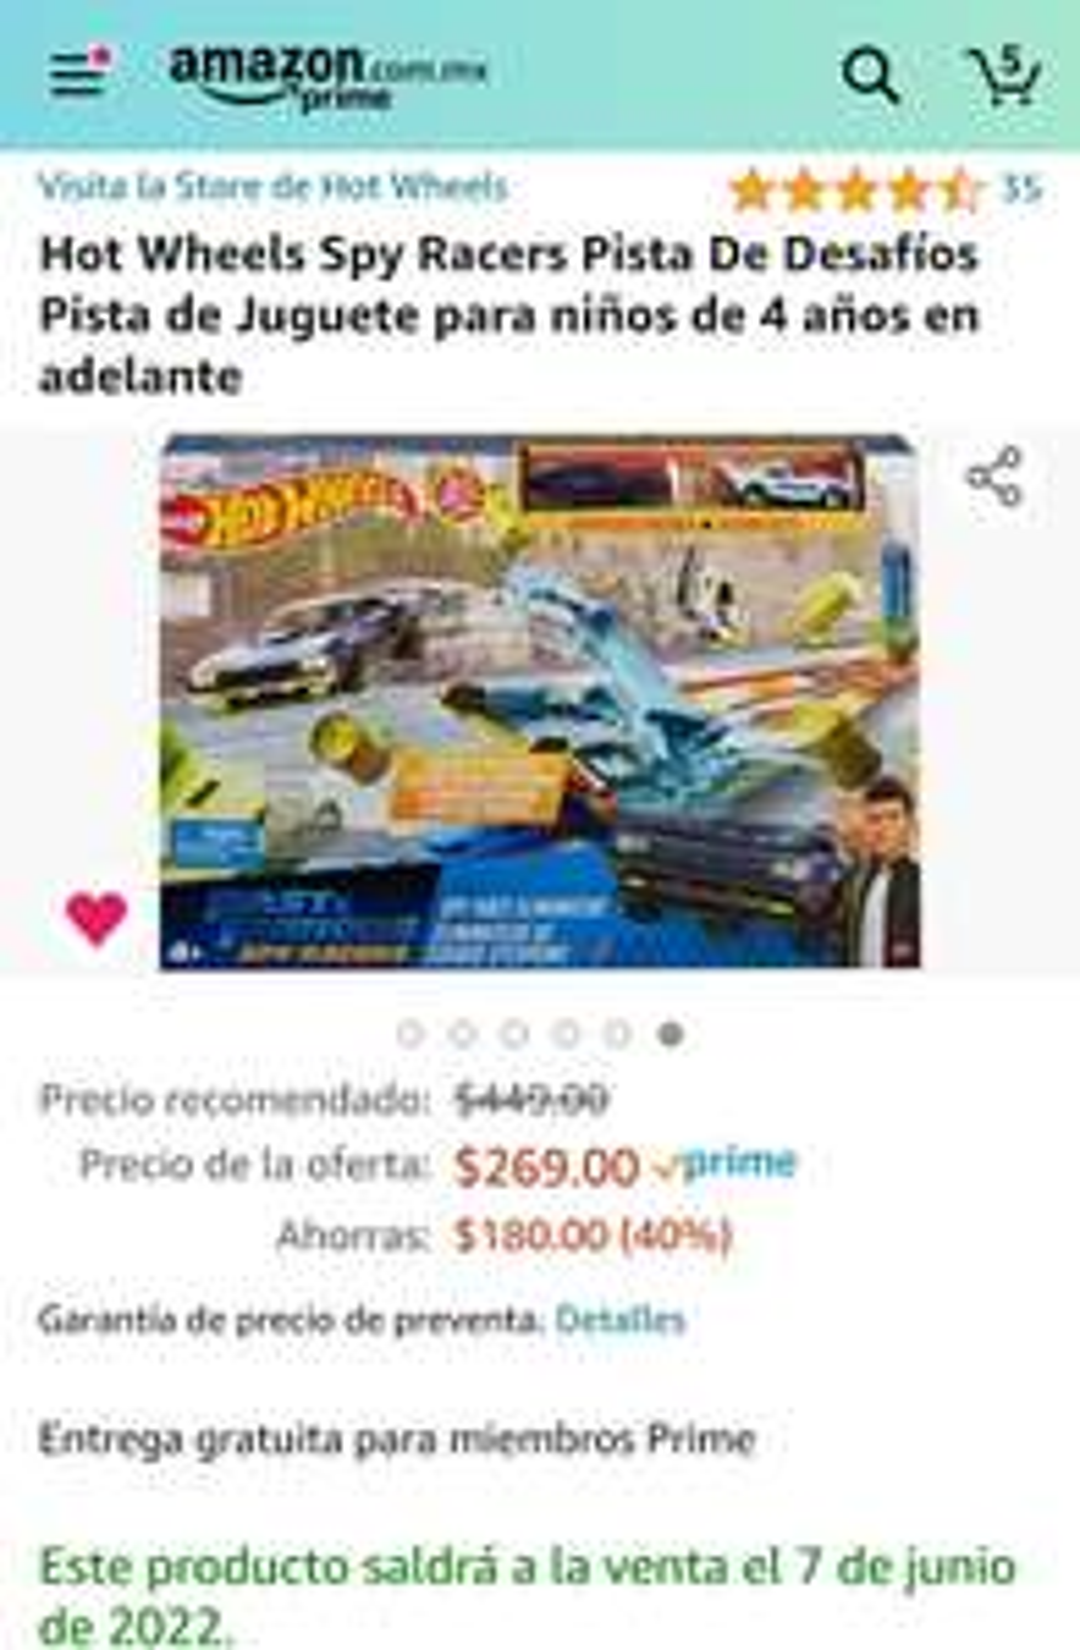 Amazon: Preventa - Hot weels spy racers